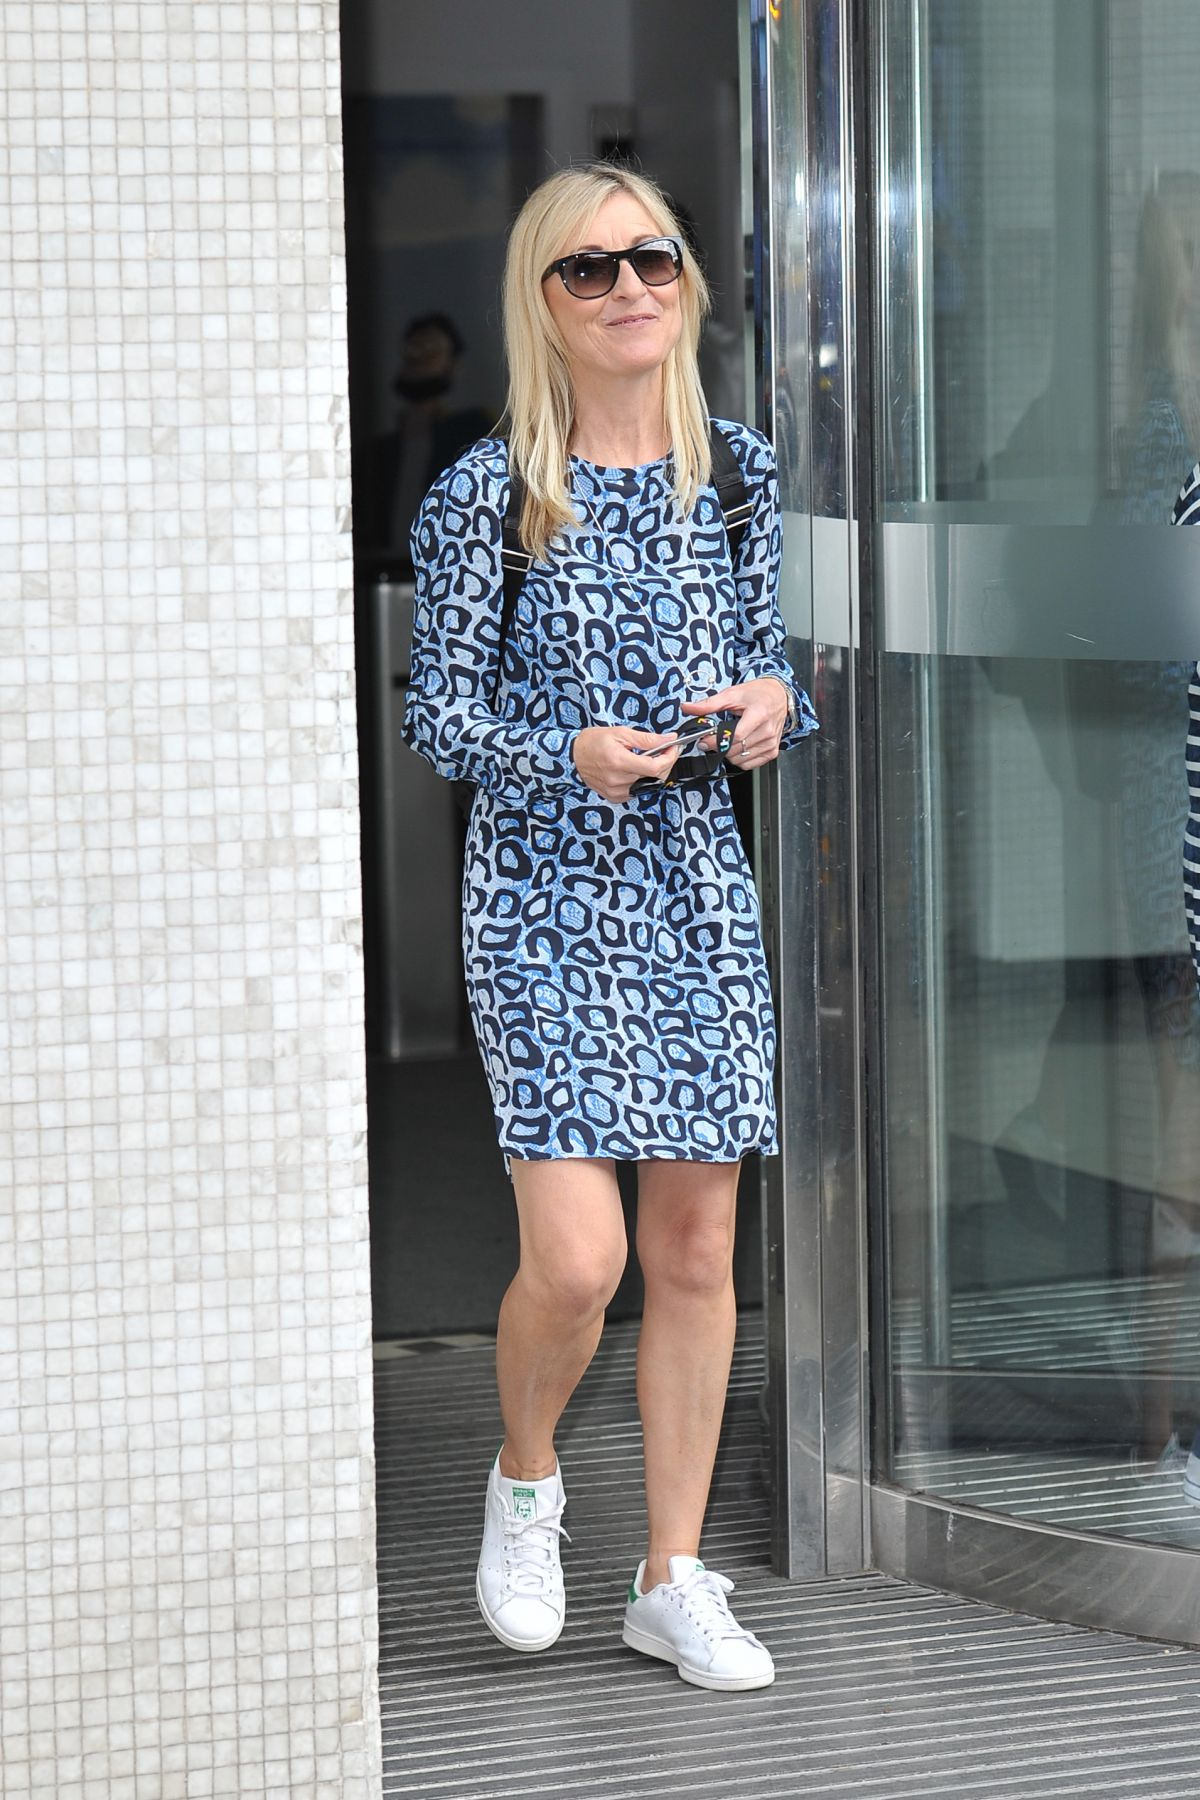 Fiona Phillips Leaves Itv Studios In London 07 25 2016